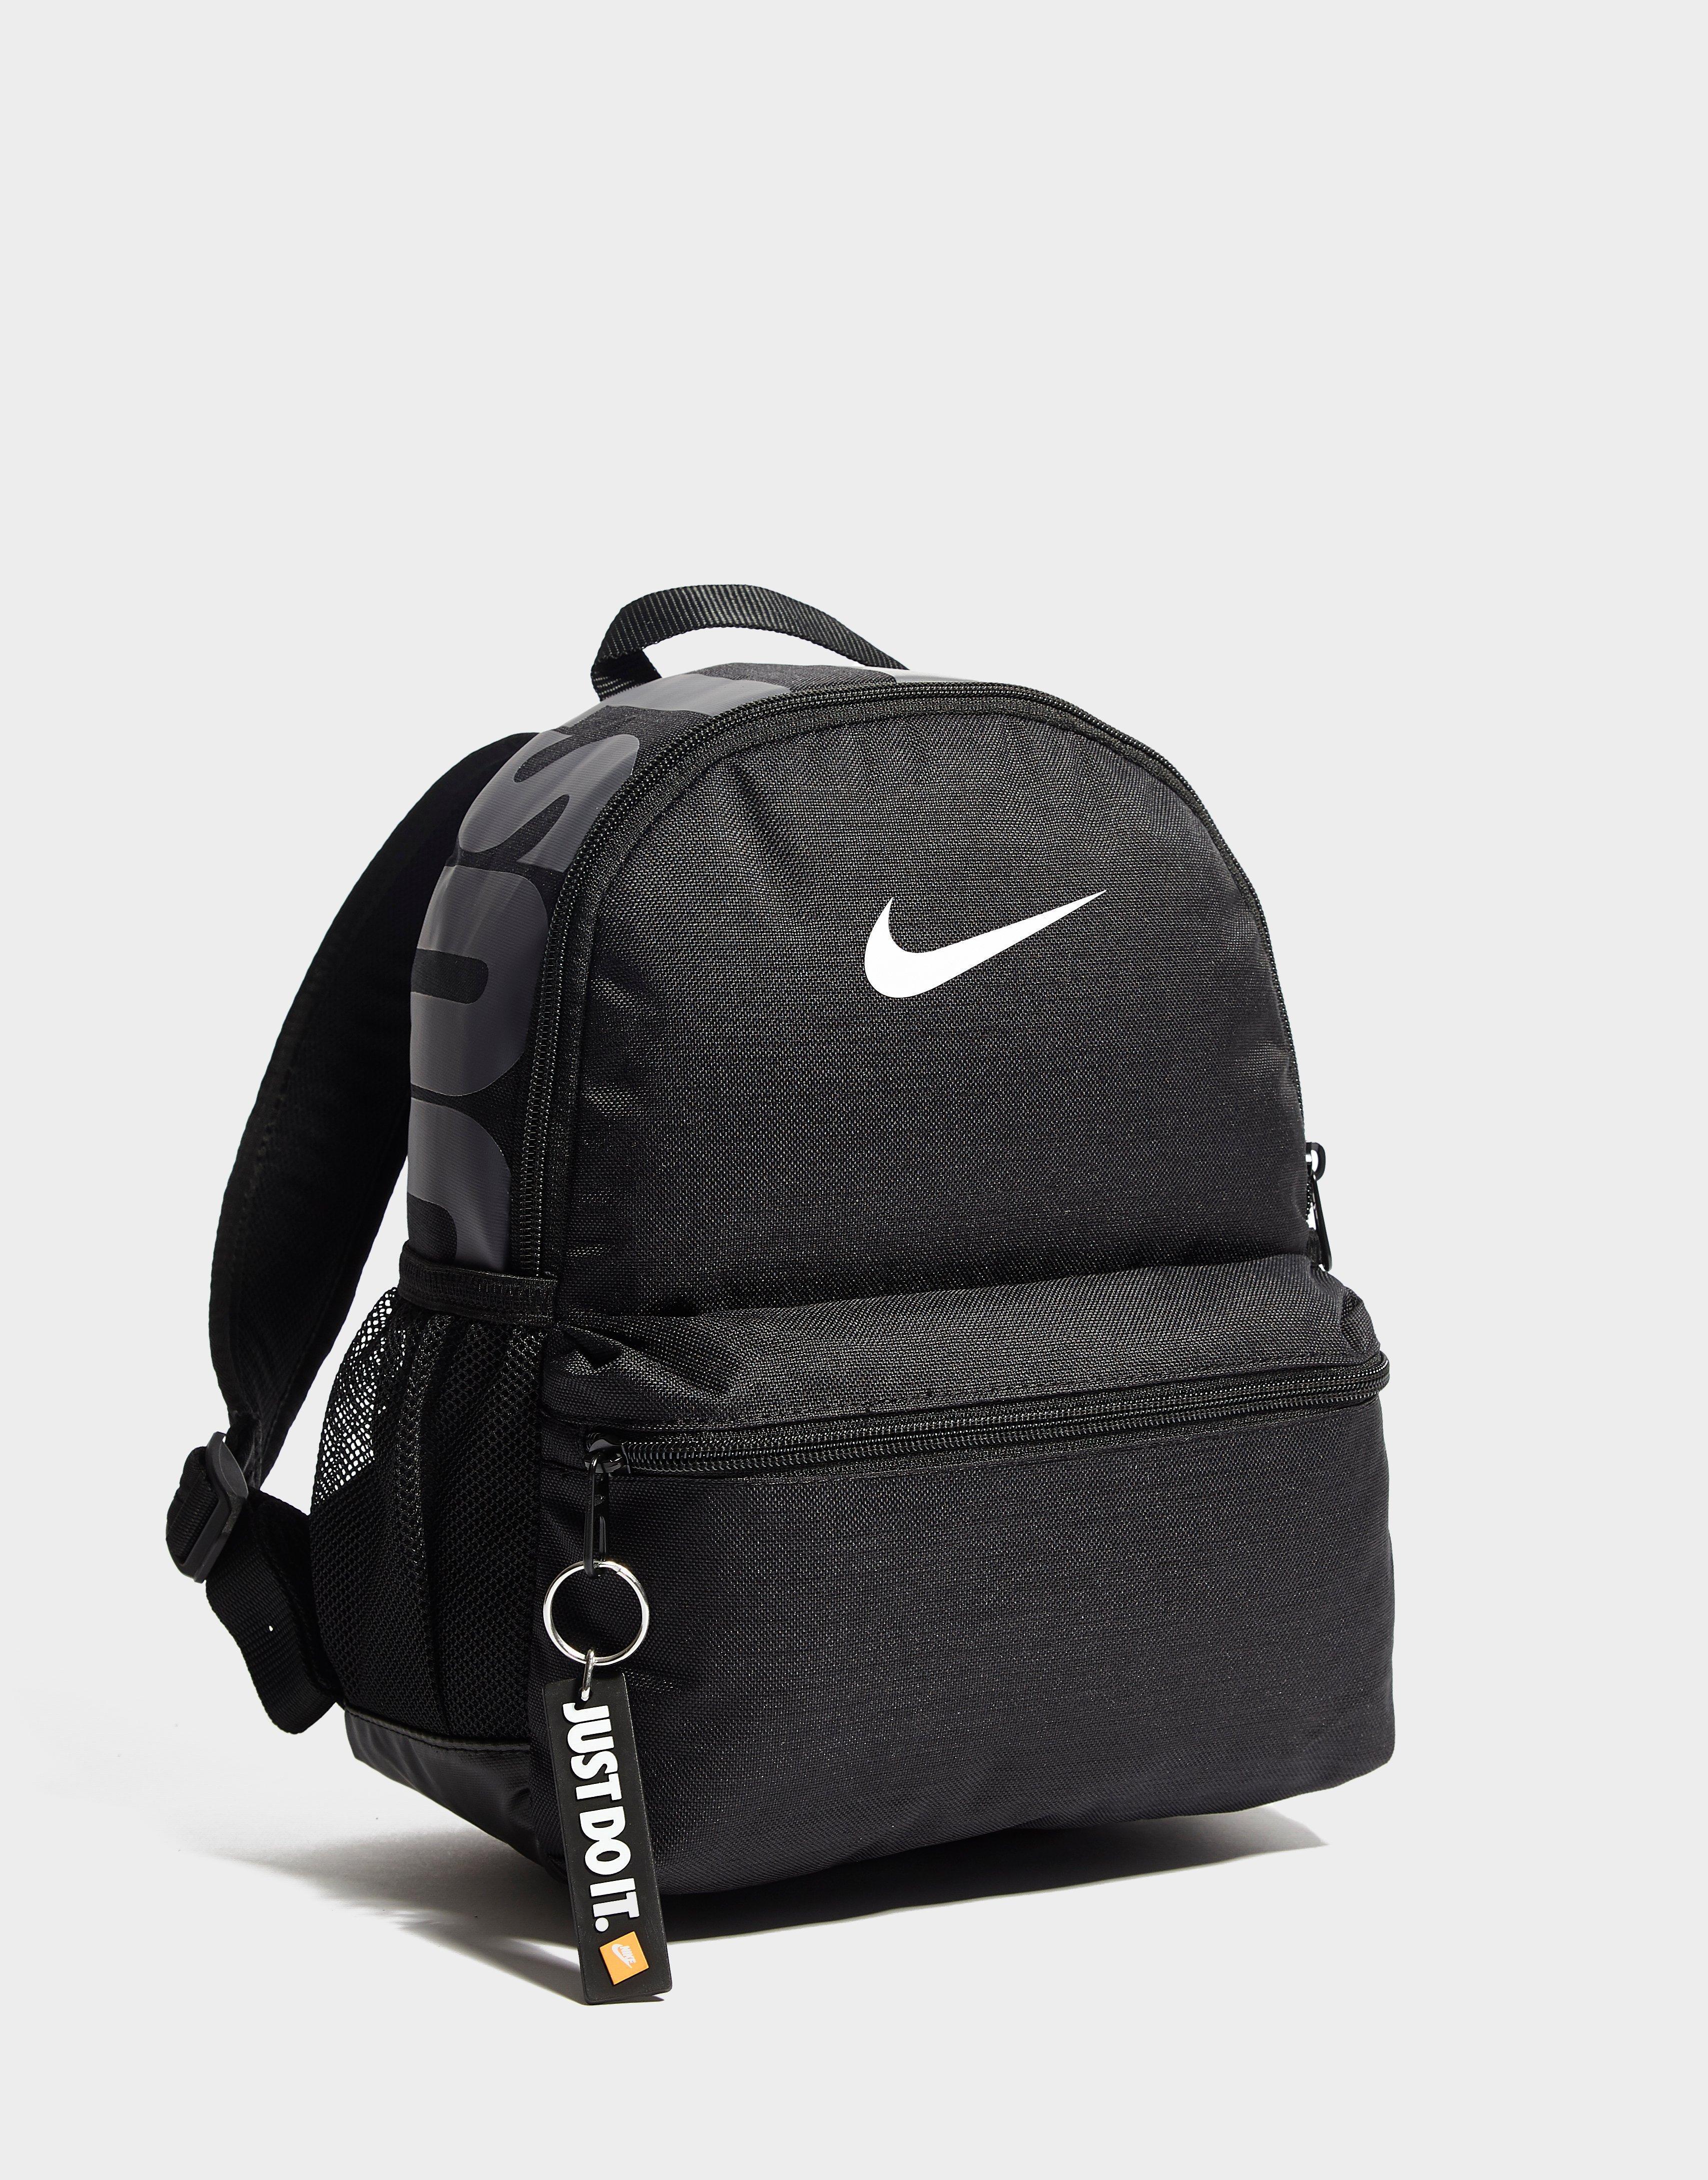 6b139686f6 Lyst - Nike Just Do It Mini Backpack in Black for Men